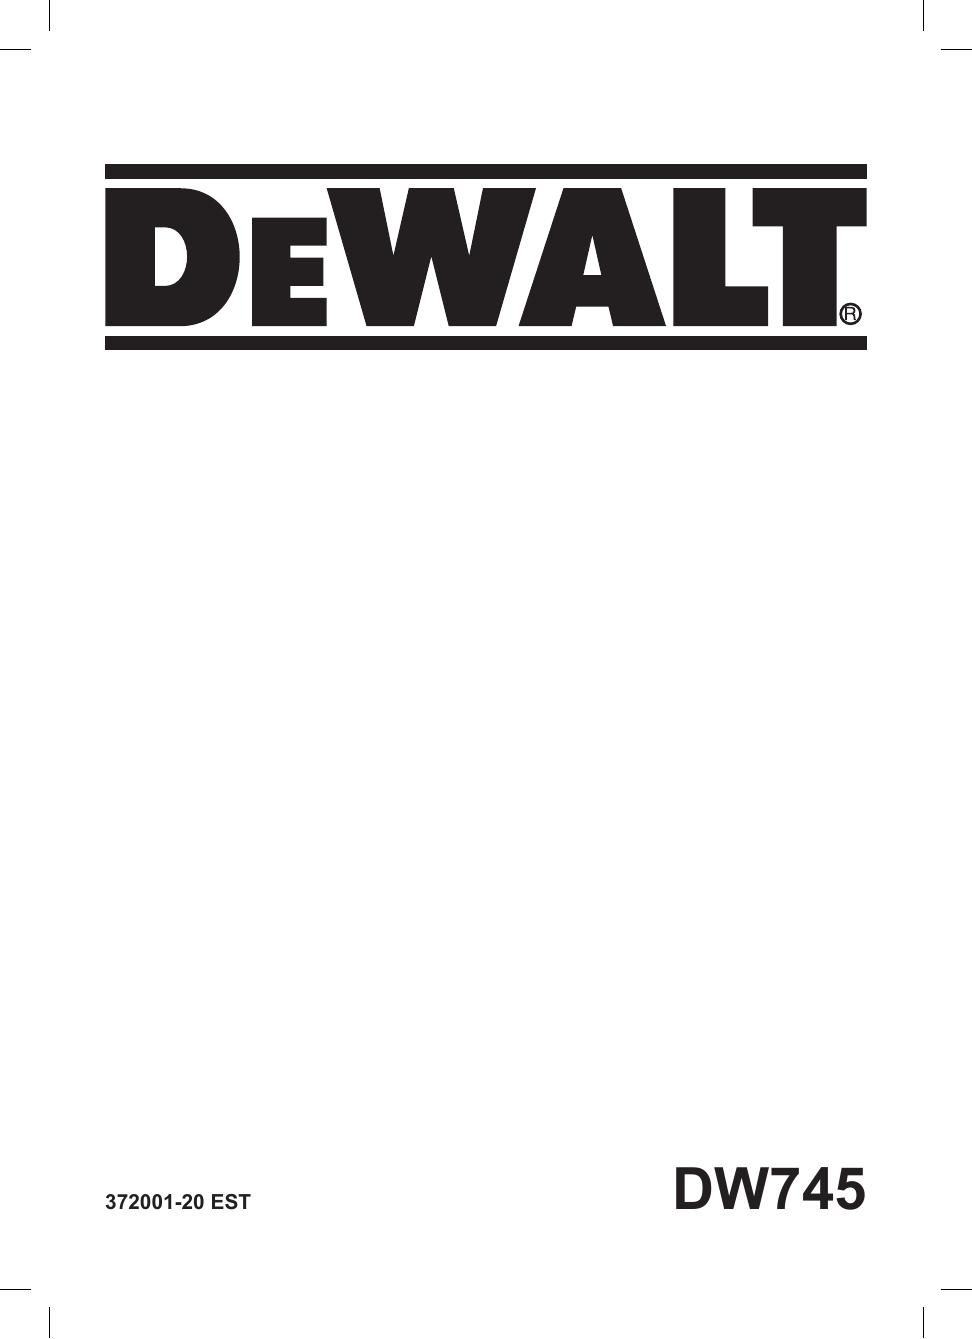 Dewalt Dw745 Table Saw Type 4 Instruction Manual Manual Guide